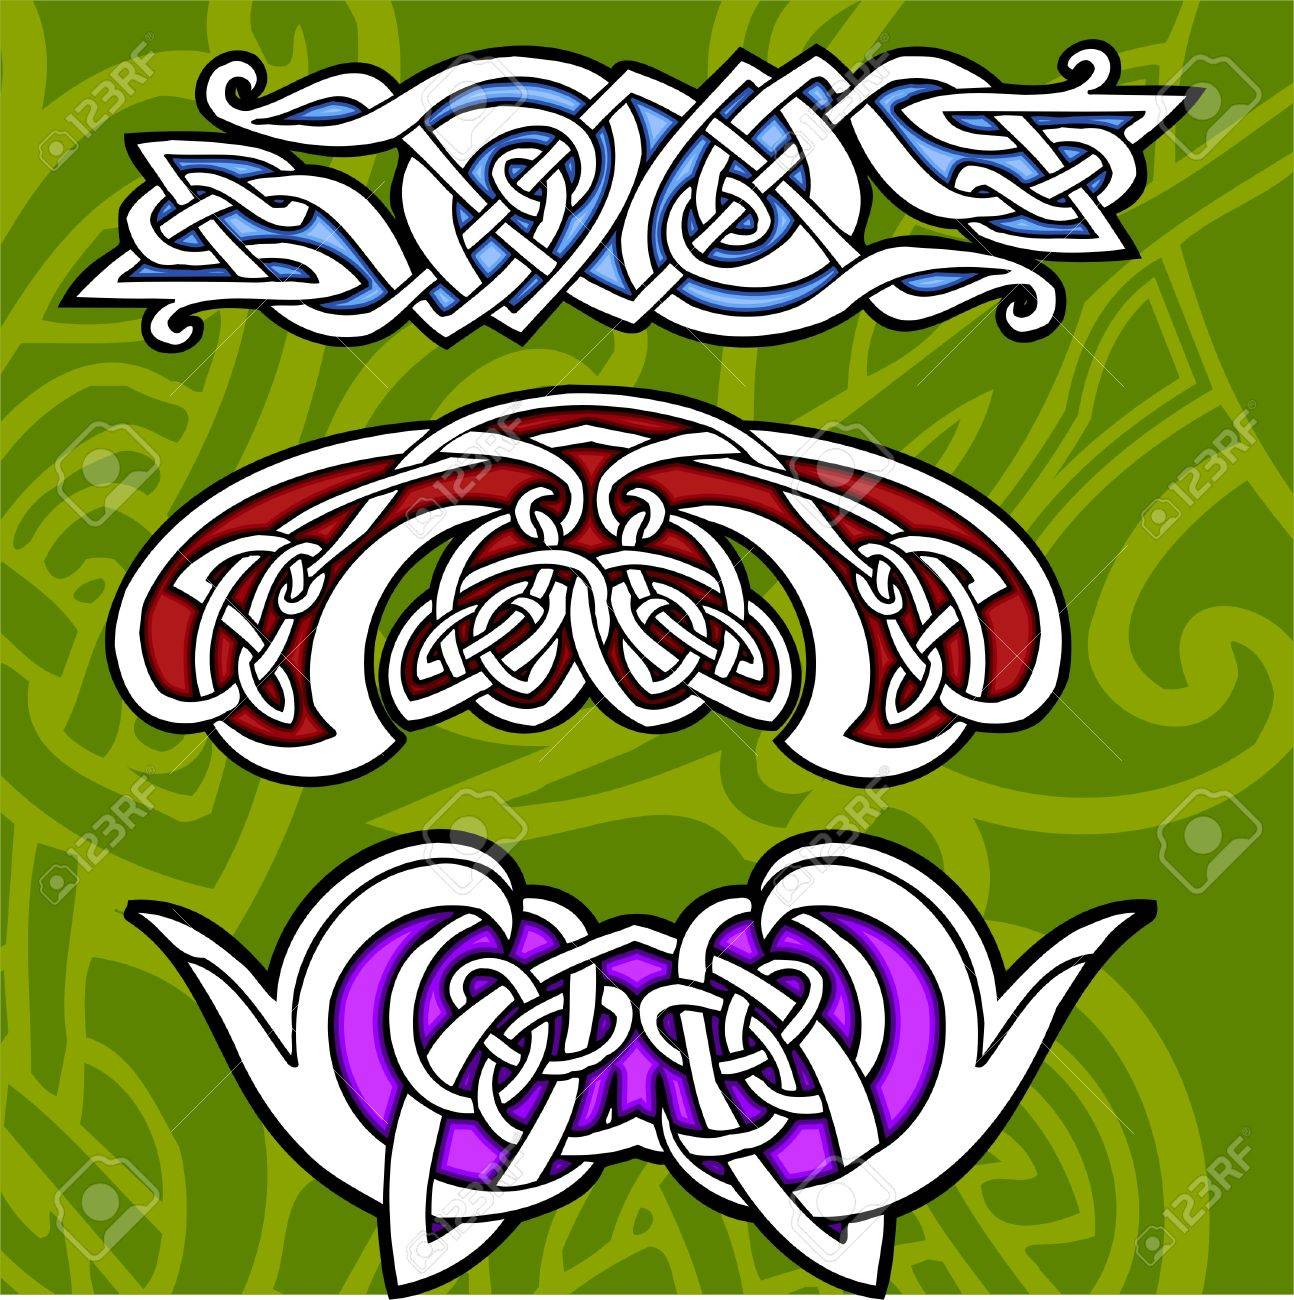 Celtic ornamental design.  Illustration. Vinyl-Ready. Stock Vector - 8268930